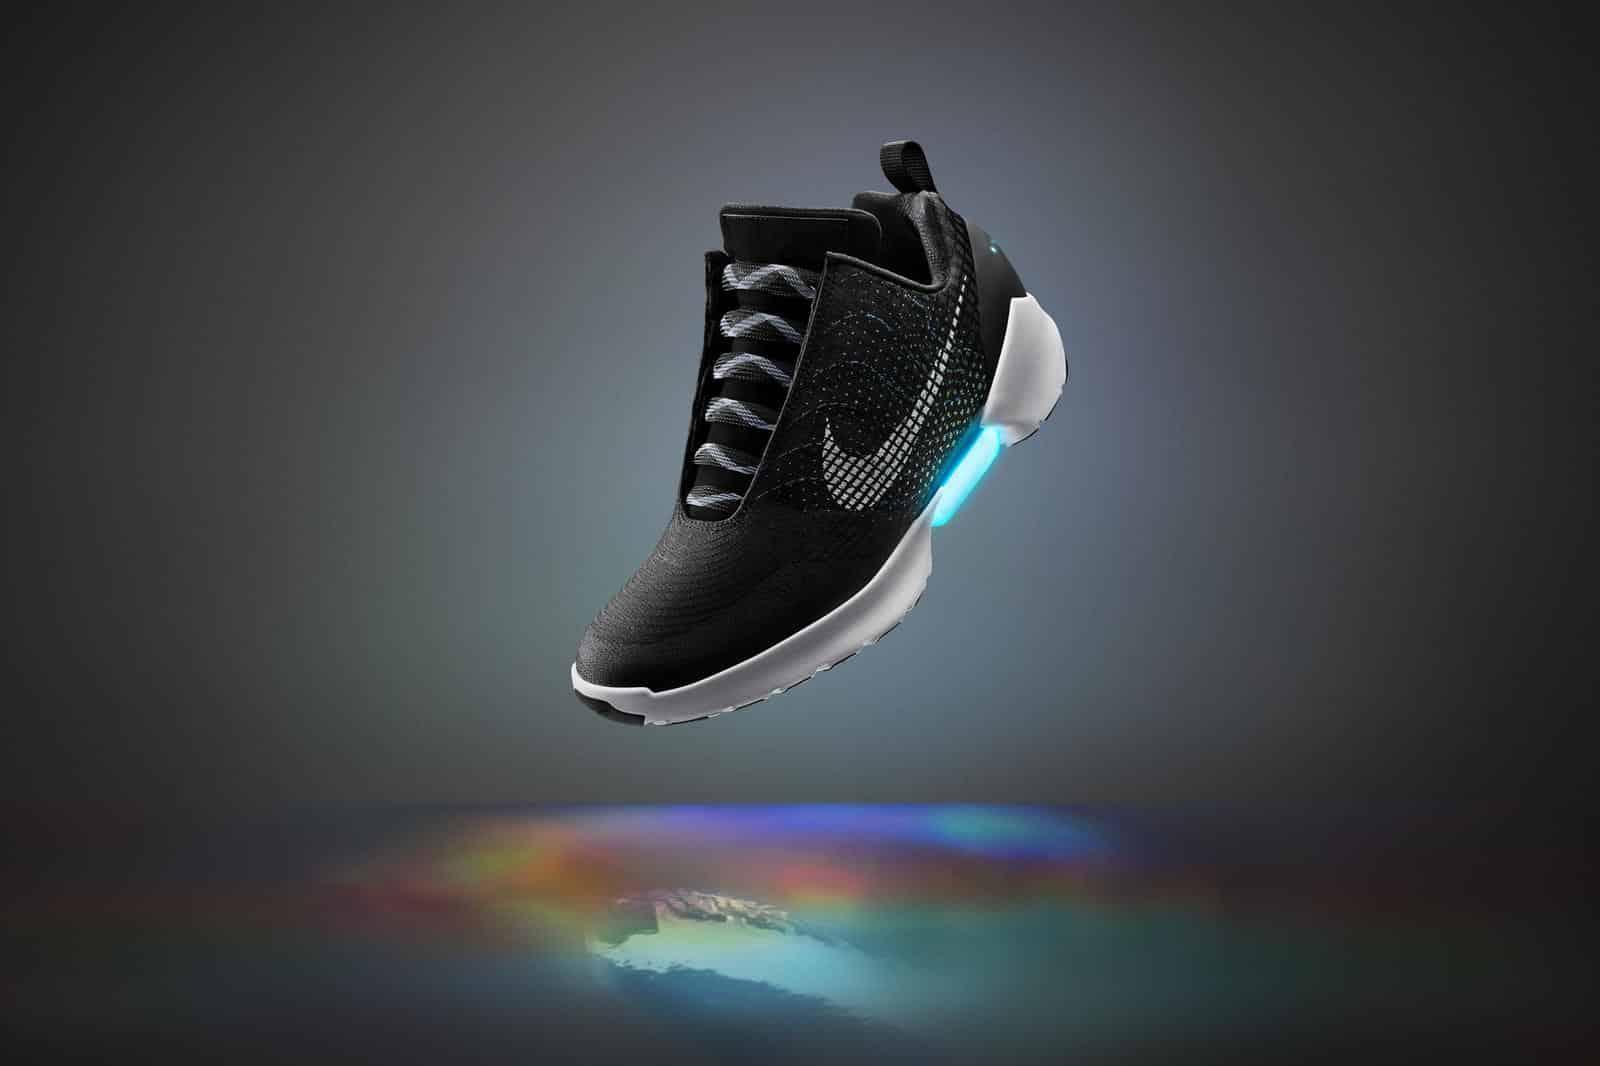 Nike HyperAdapt 1.0 auto-lassante